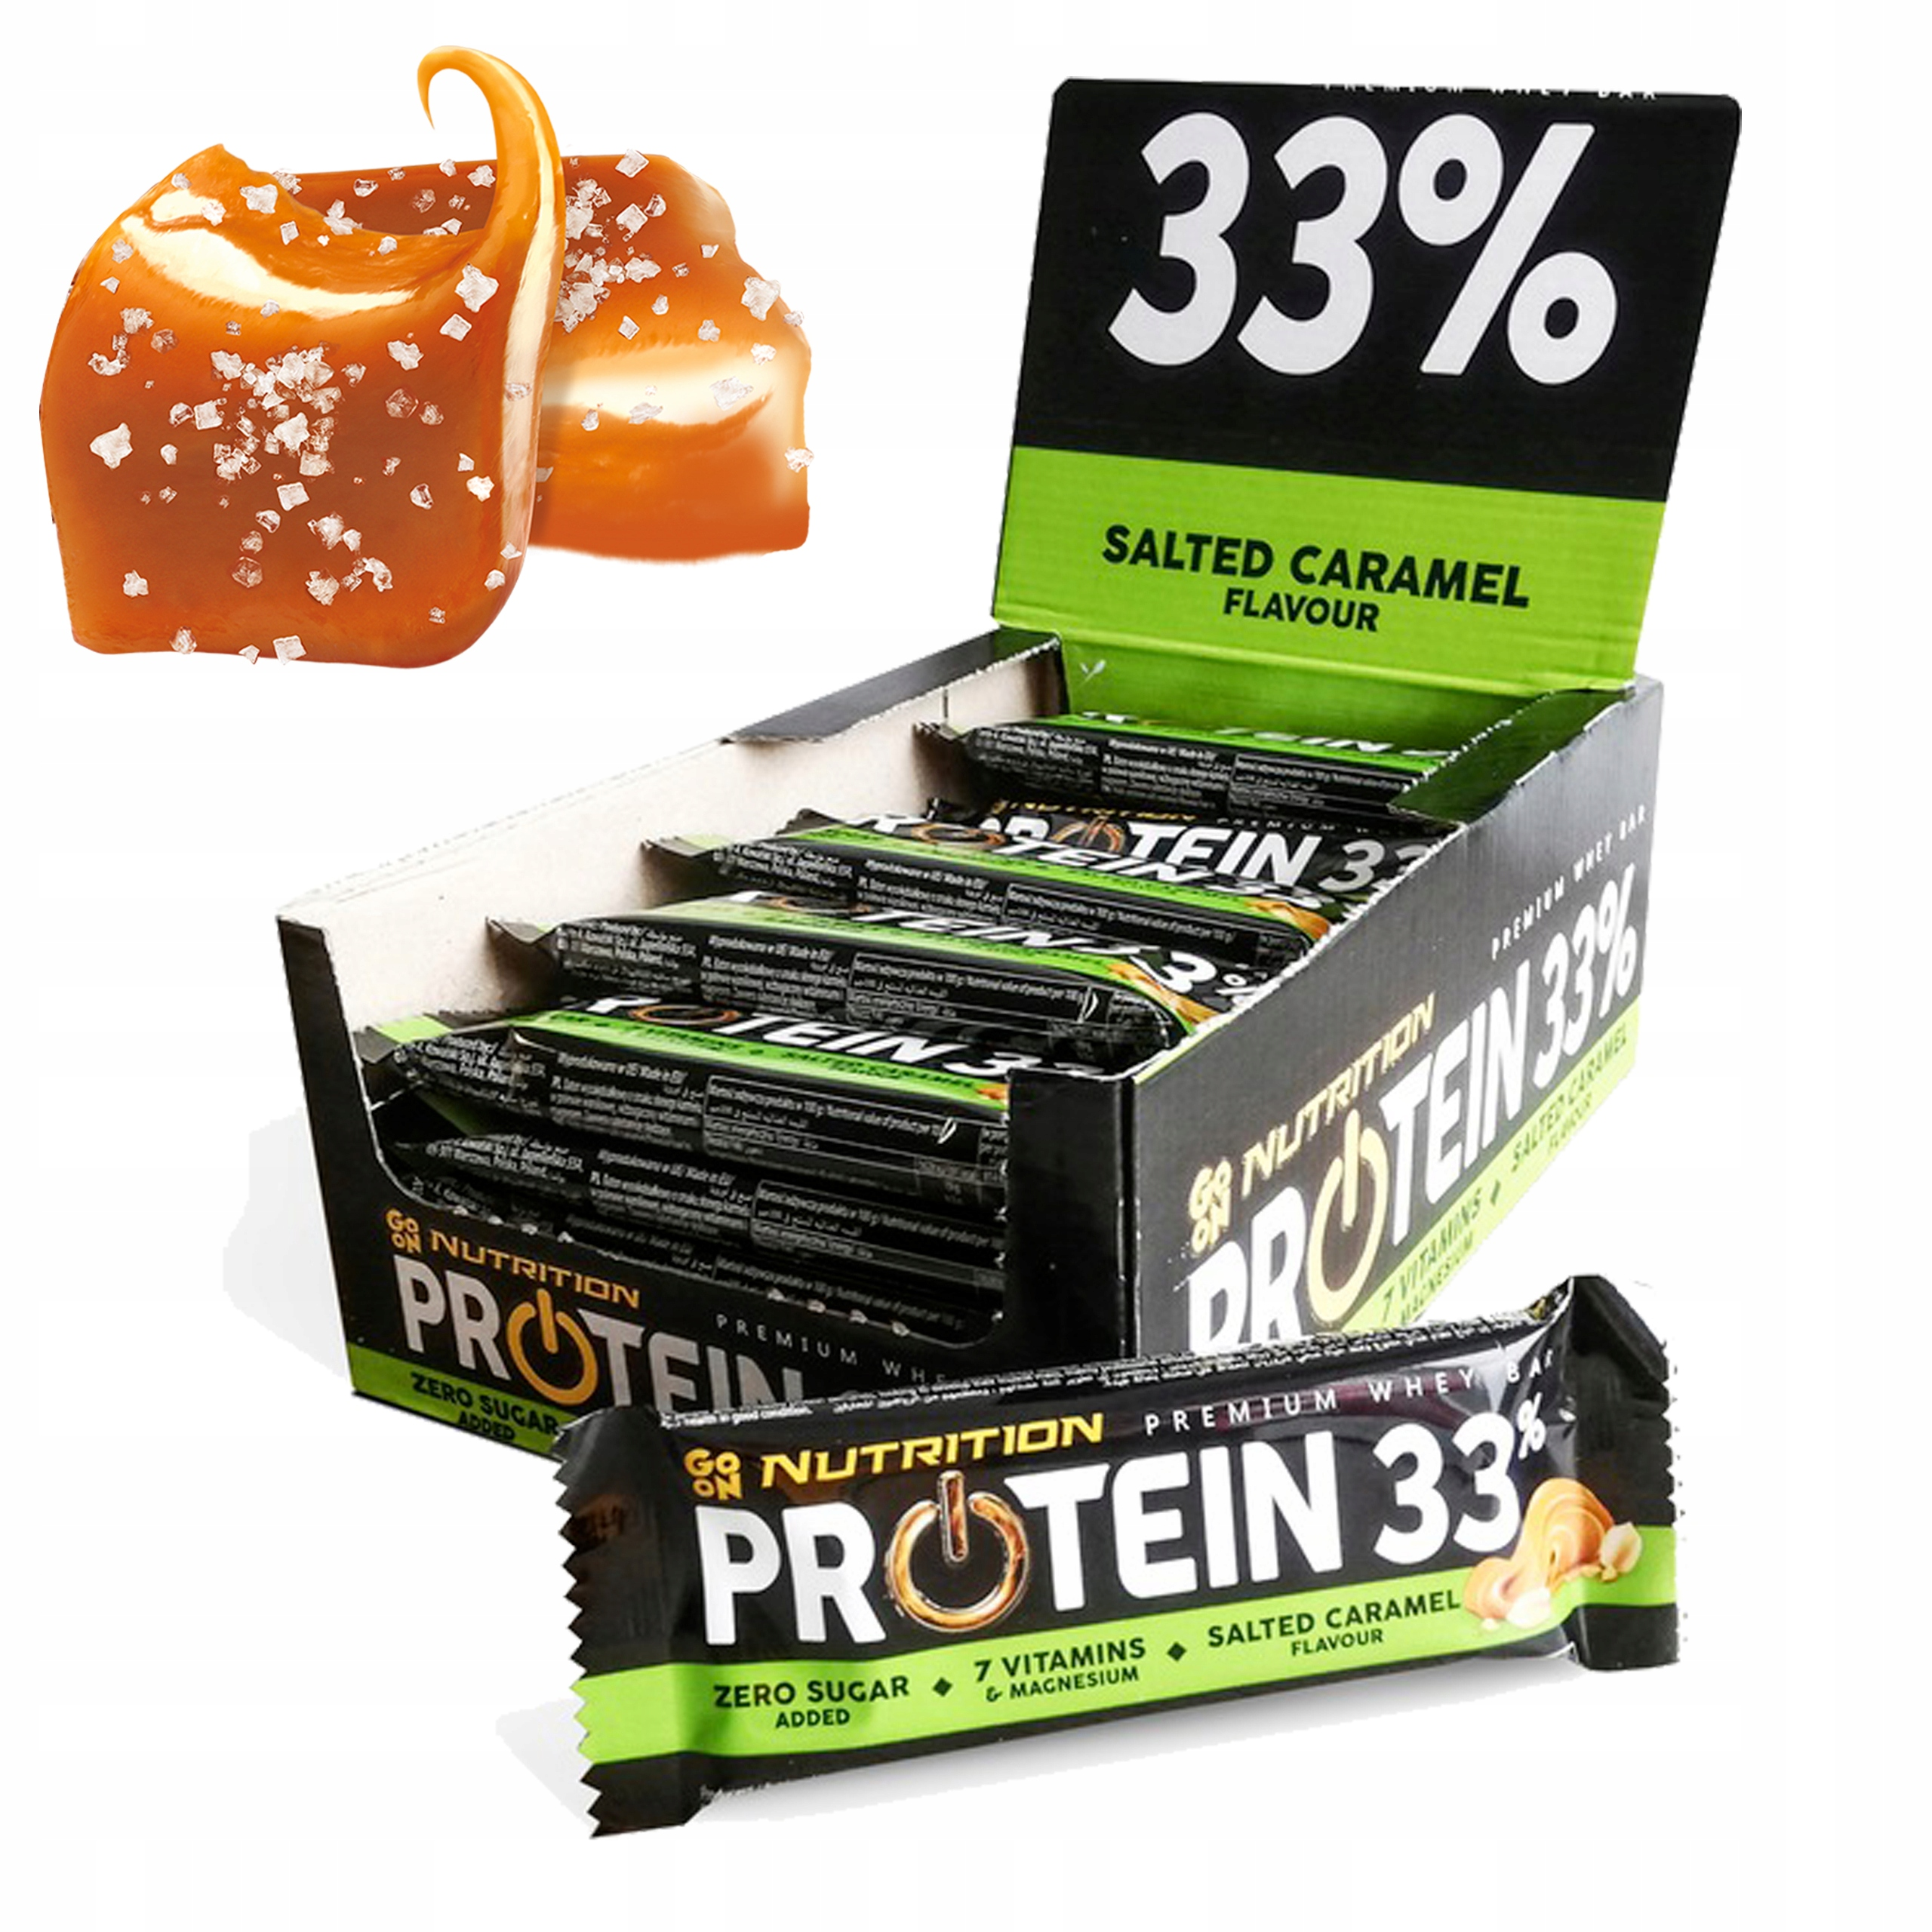 JE TO NUTRITION PROTEIN BAR 33% 25x50g BOX BIELKOVÍN